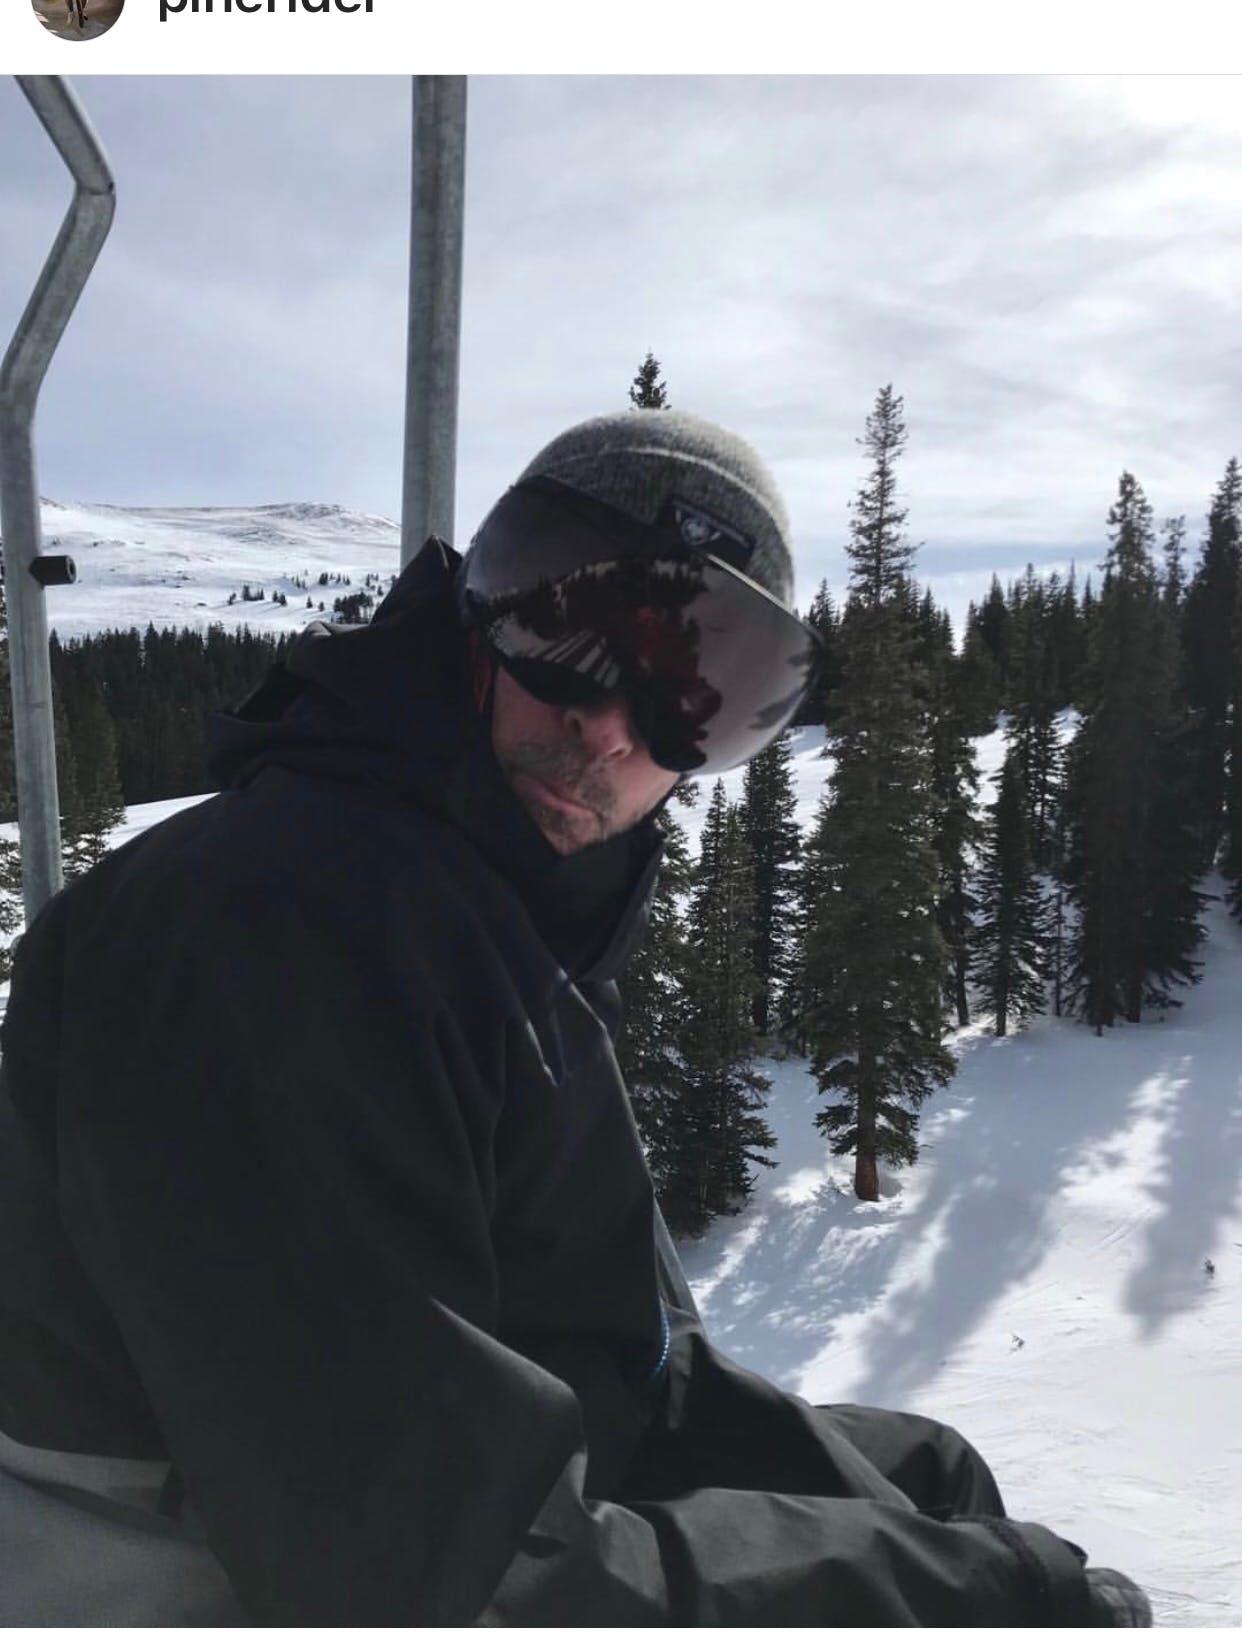 Winter Sports Expert Mike Osborne